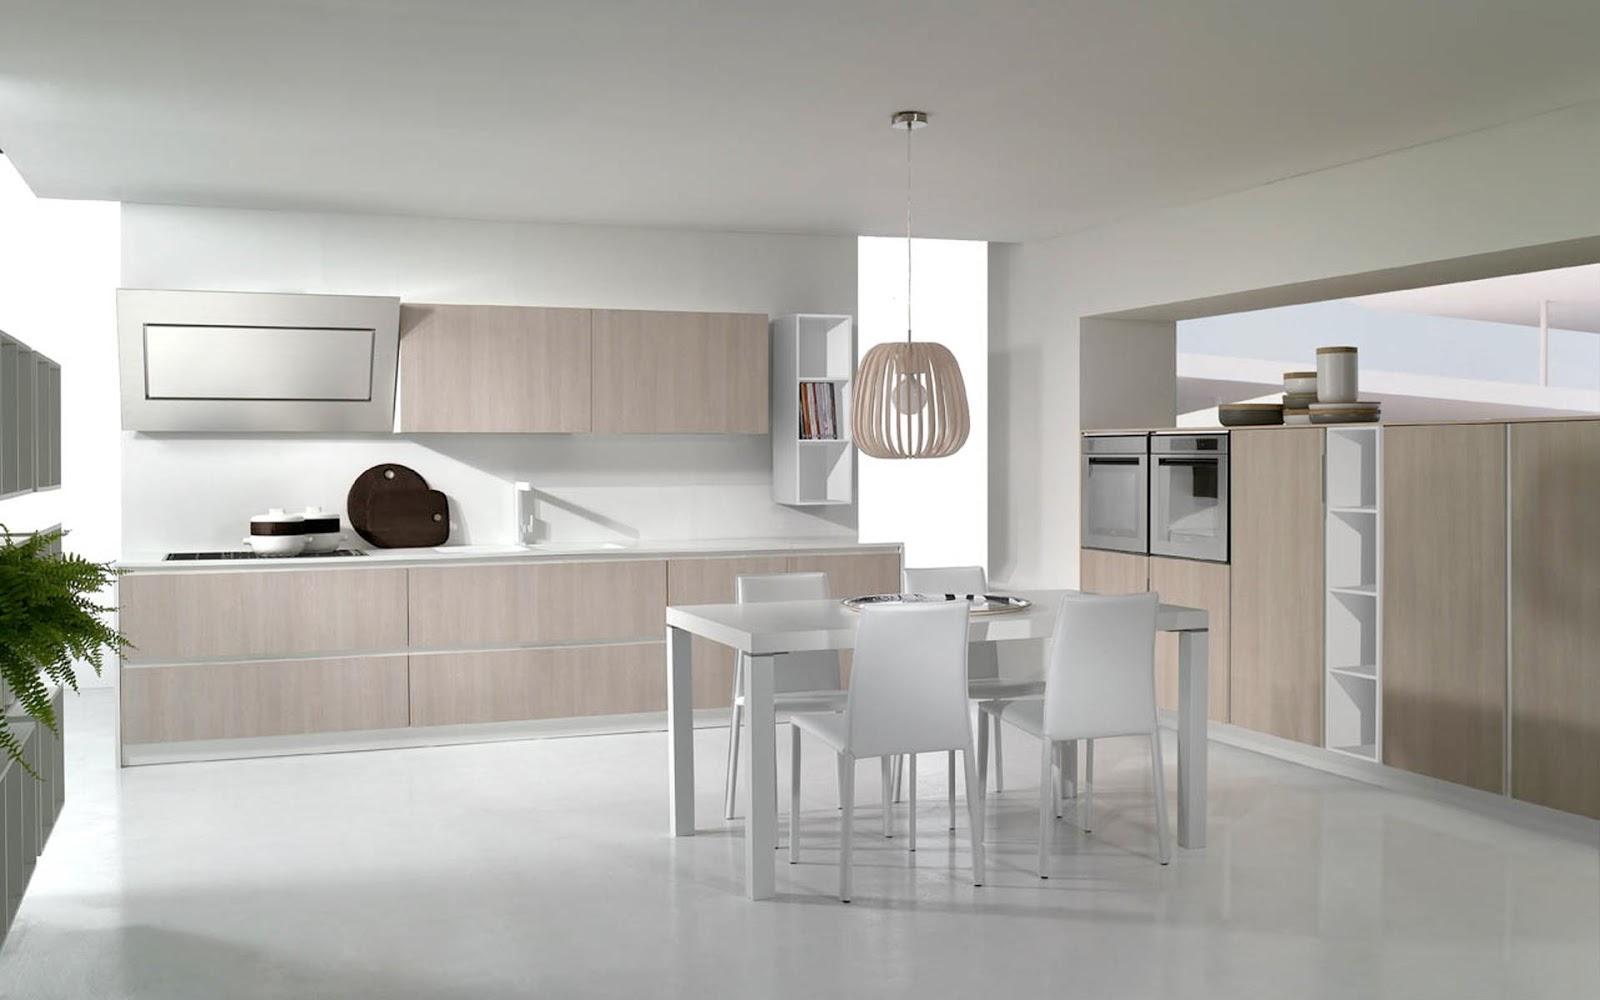 Emejing Arredo Cucina Moderna Piccola Gallery - Ideas & Design ...